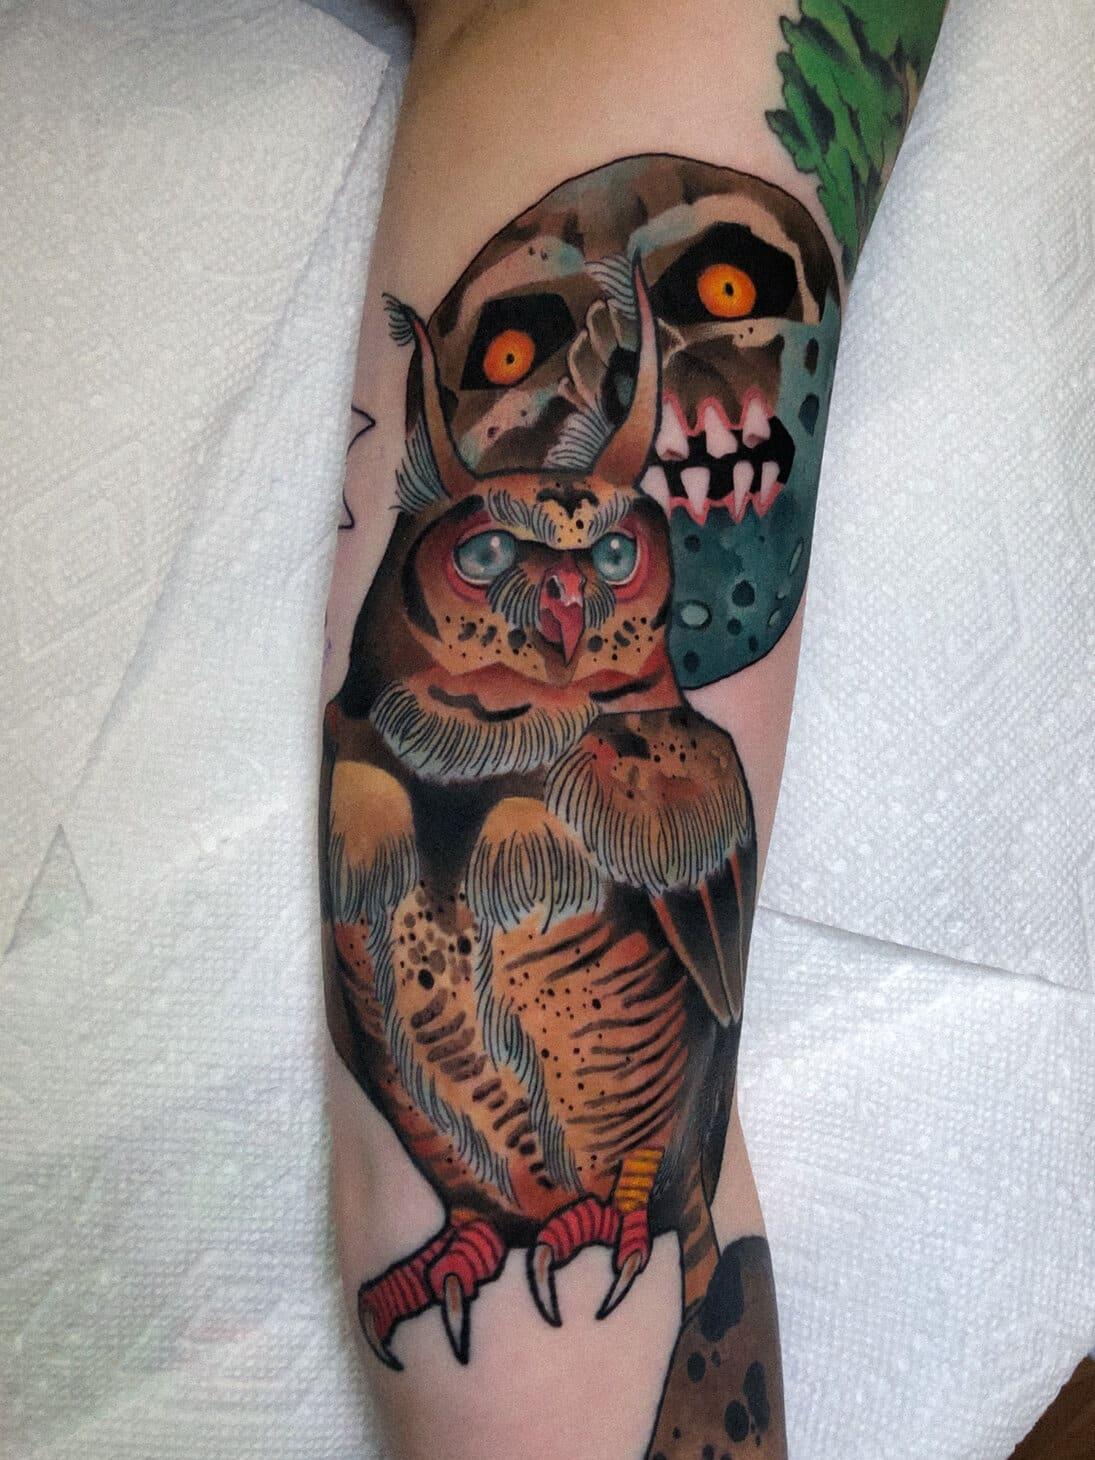 igor-puente-tattoo-artist-owl